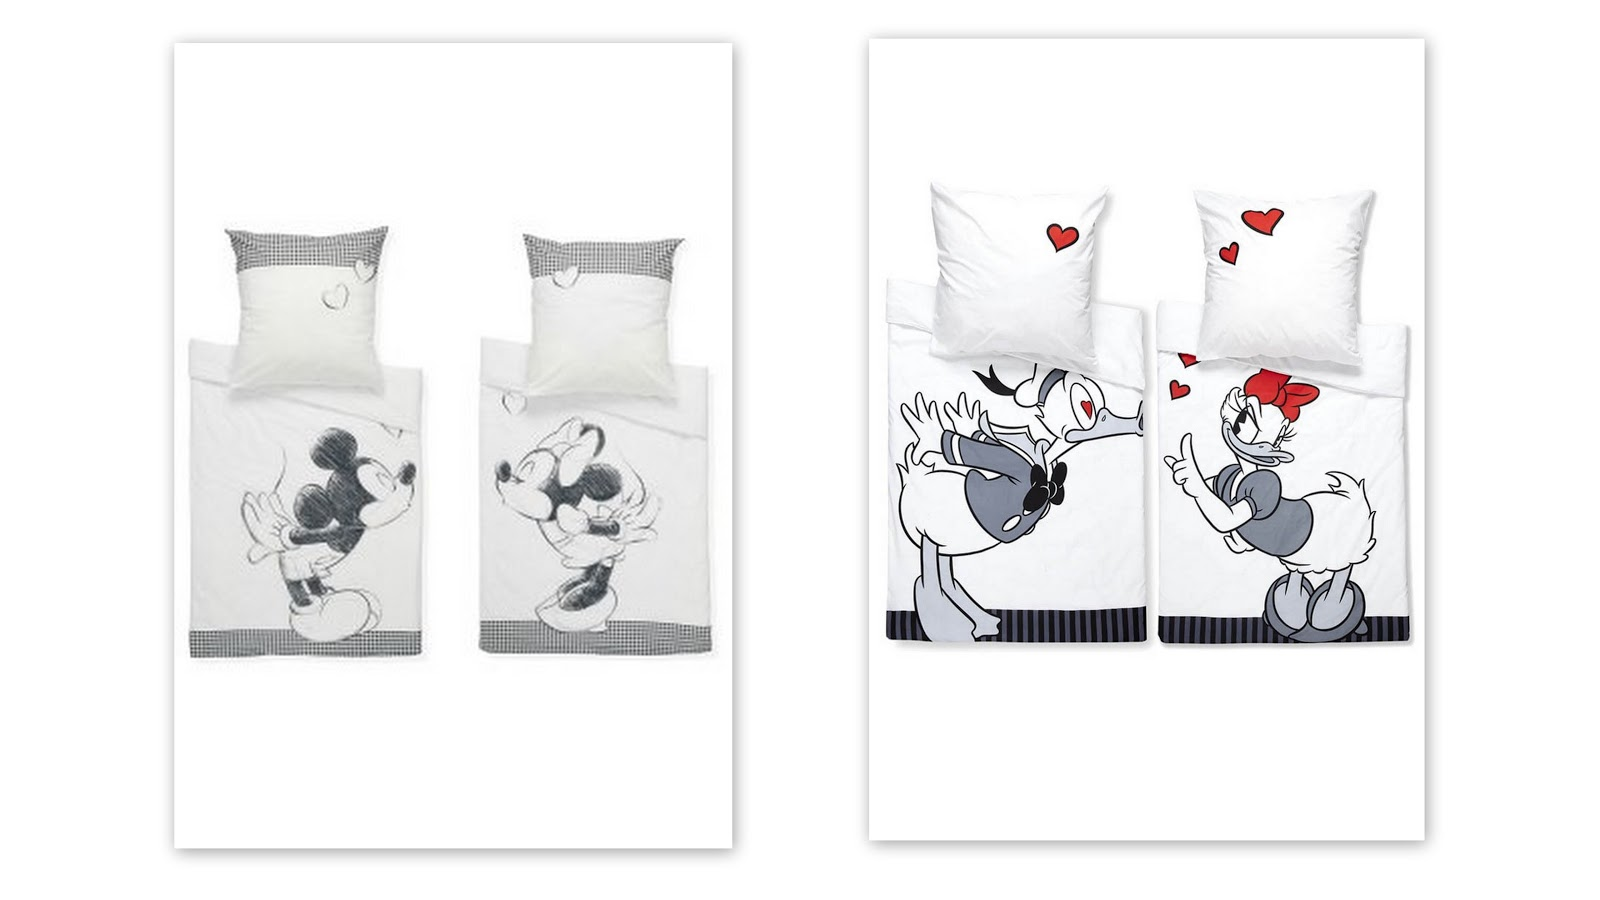 sengetøj disney Dyreglad pige: Disney sengetøj sengetøj disney